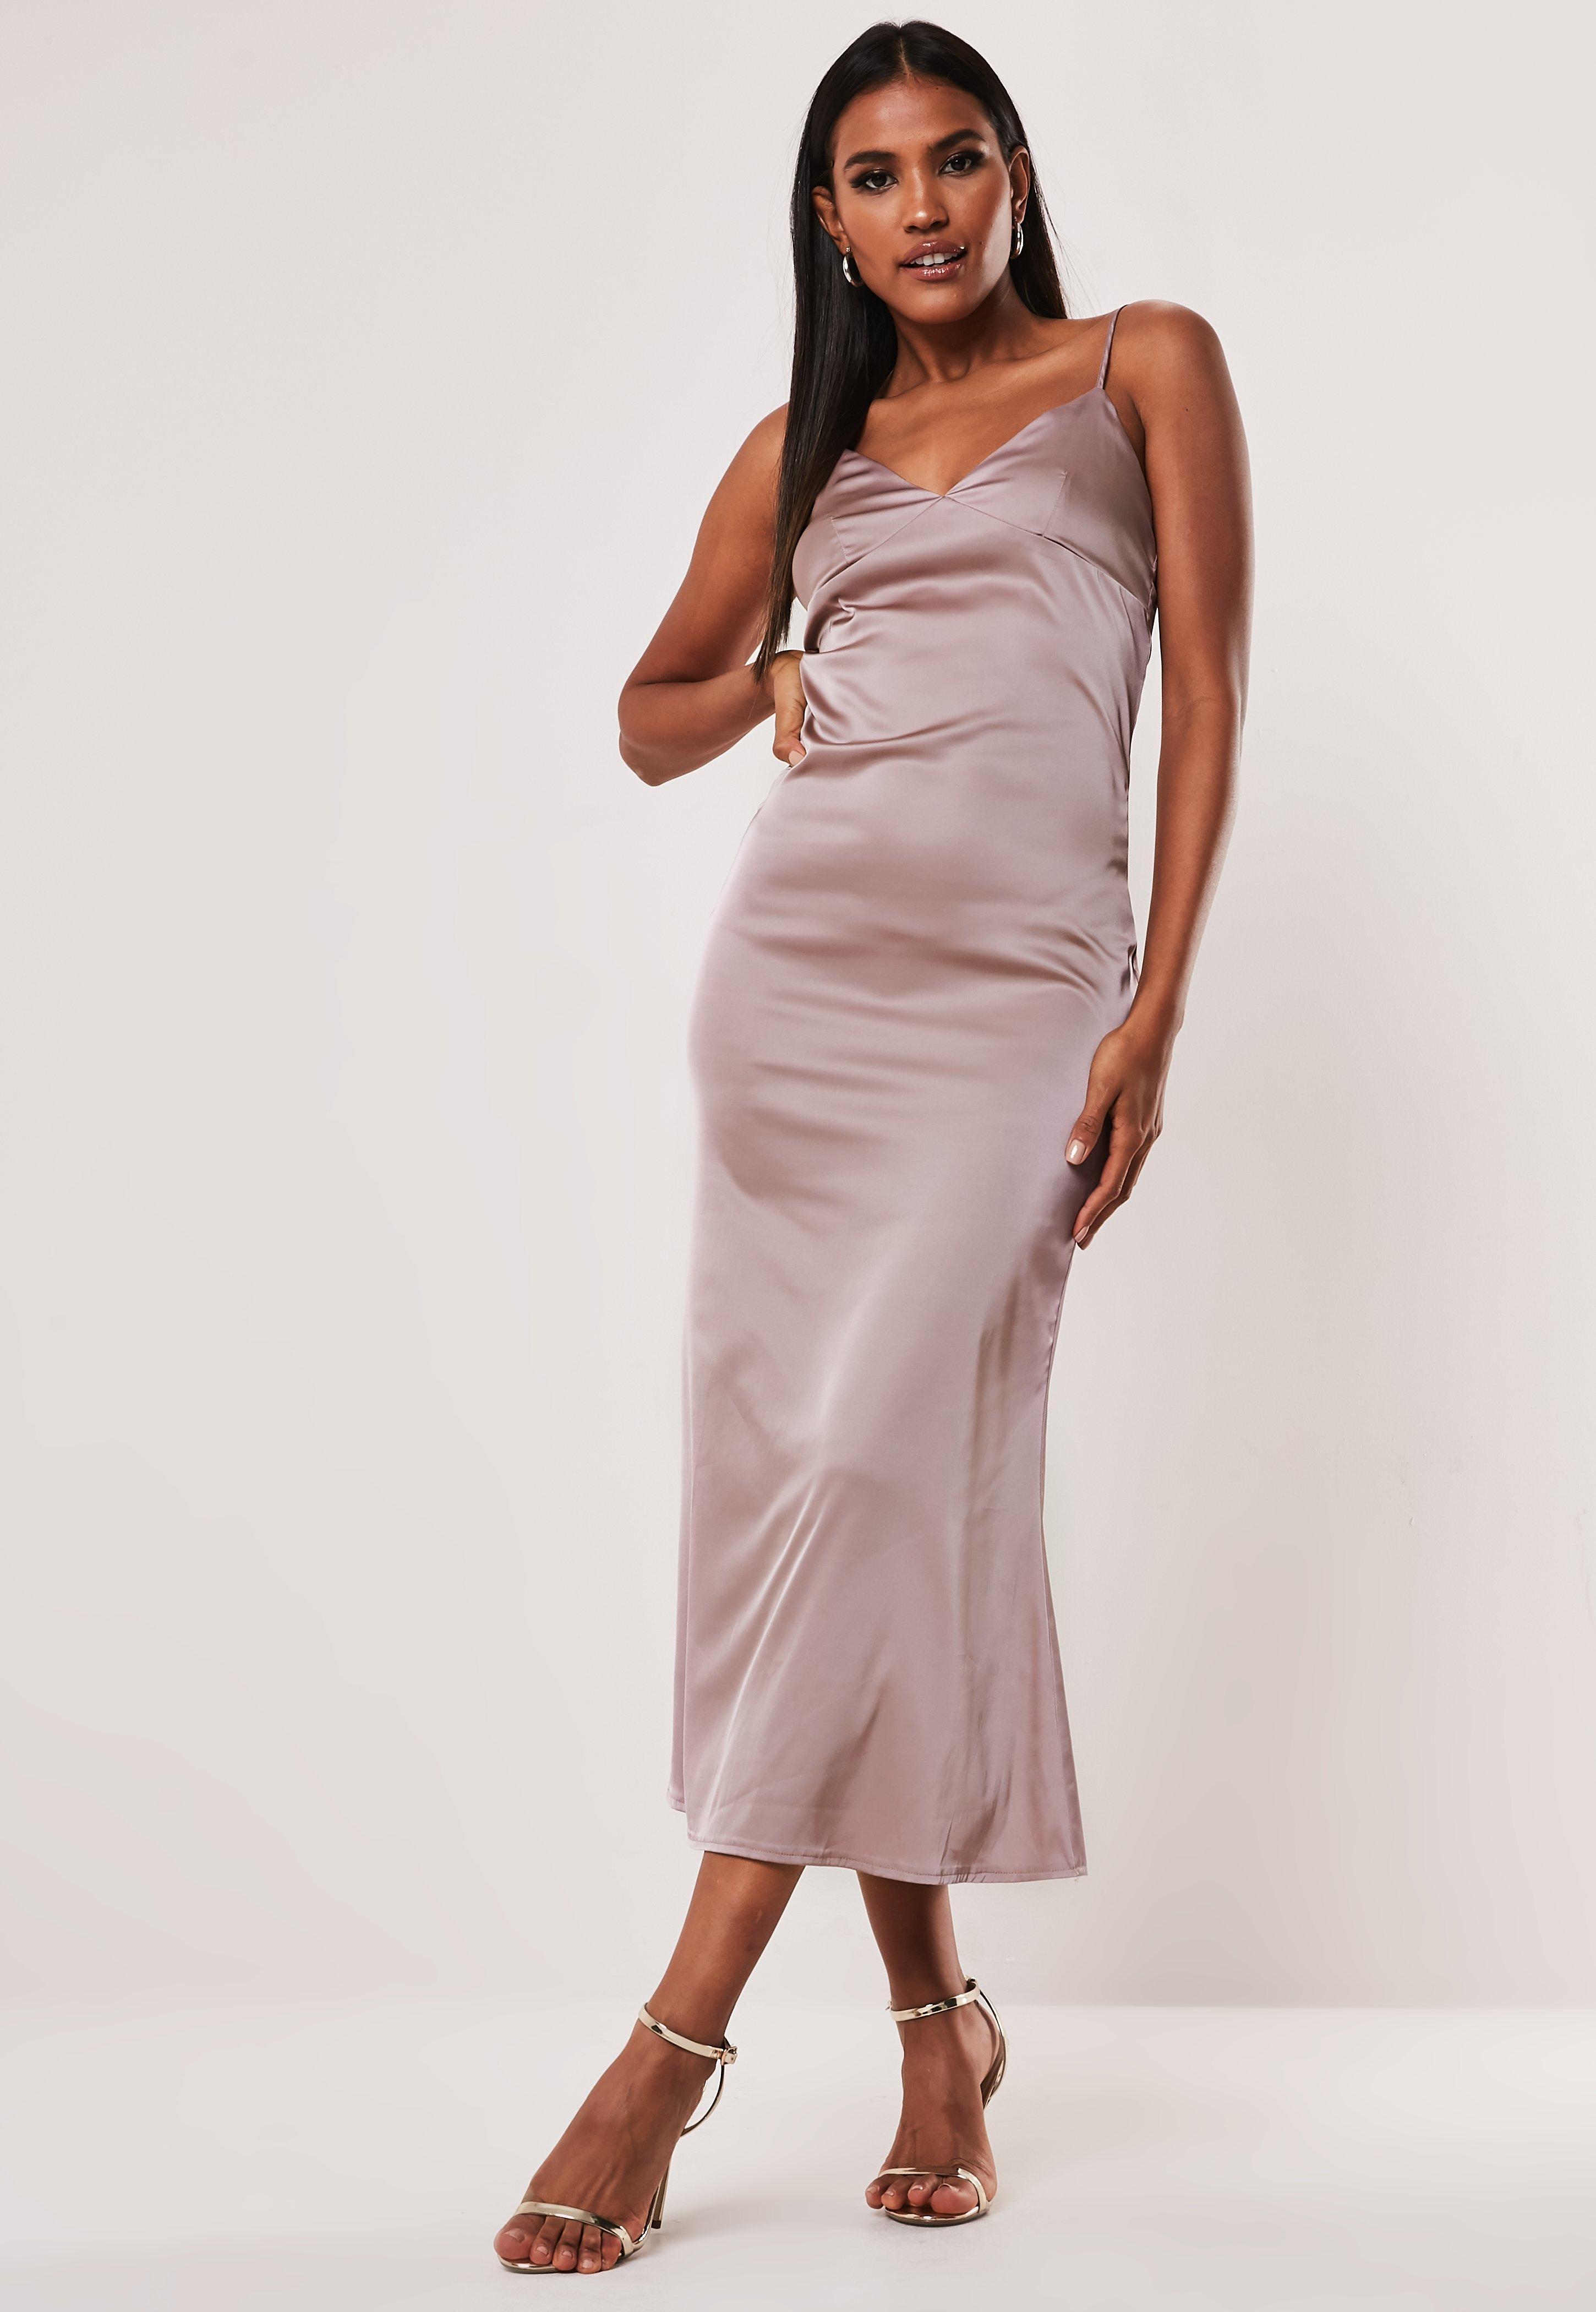 30f581b7ed21 Satin Dresses | Shop Silky Dresses Online - Missguided